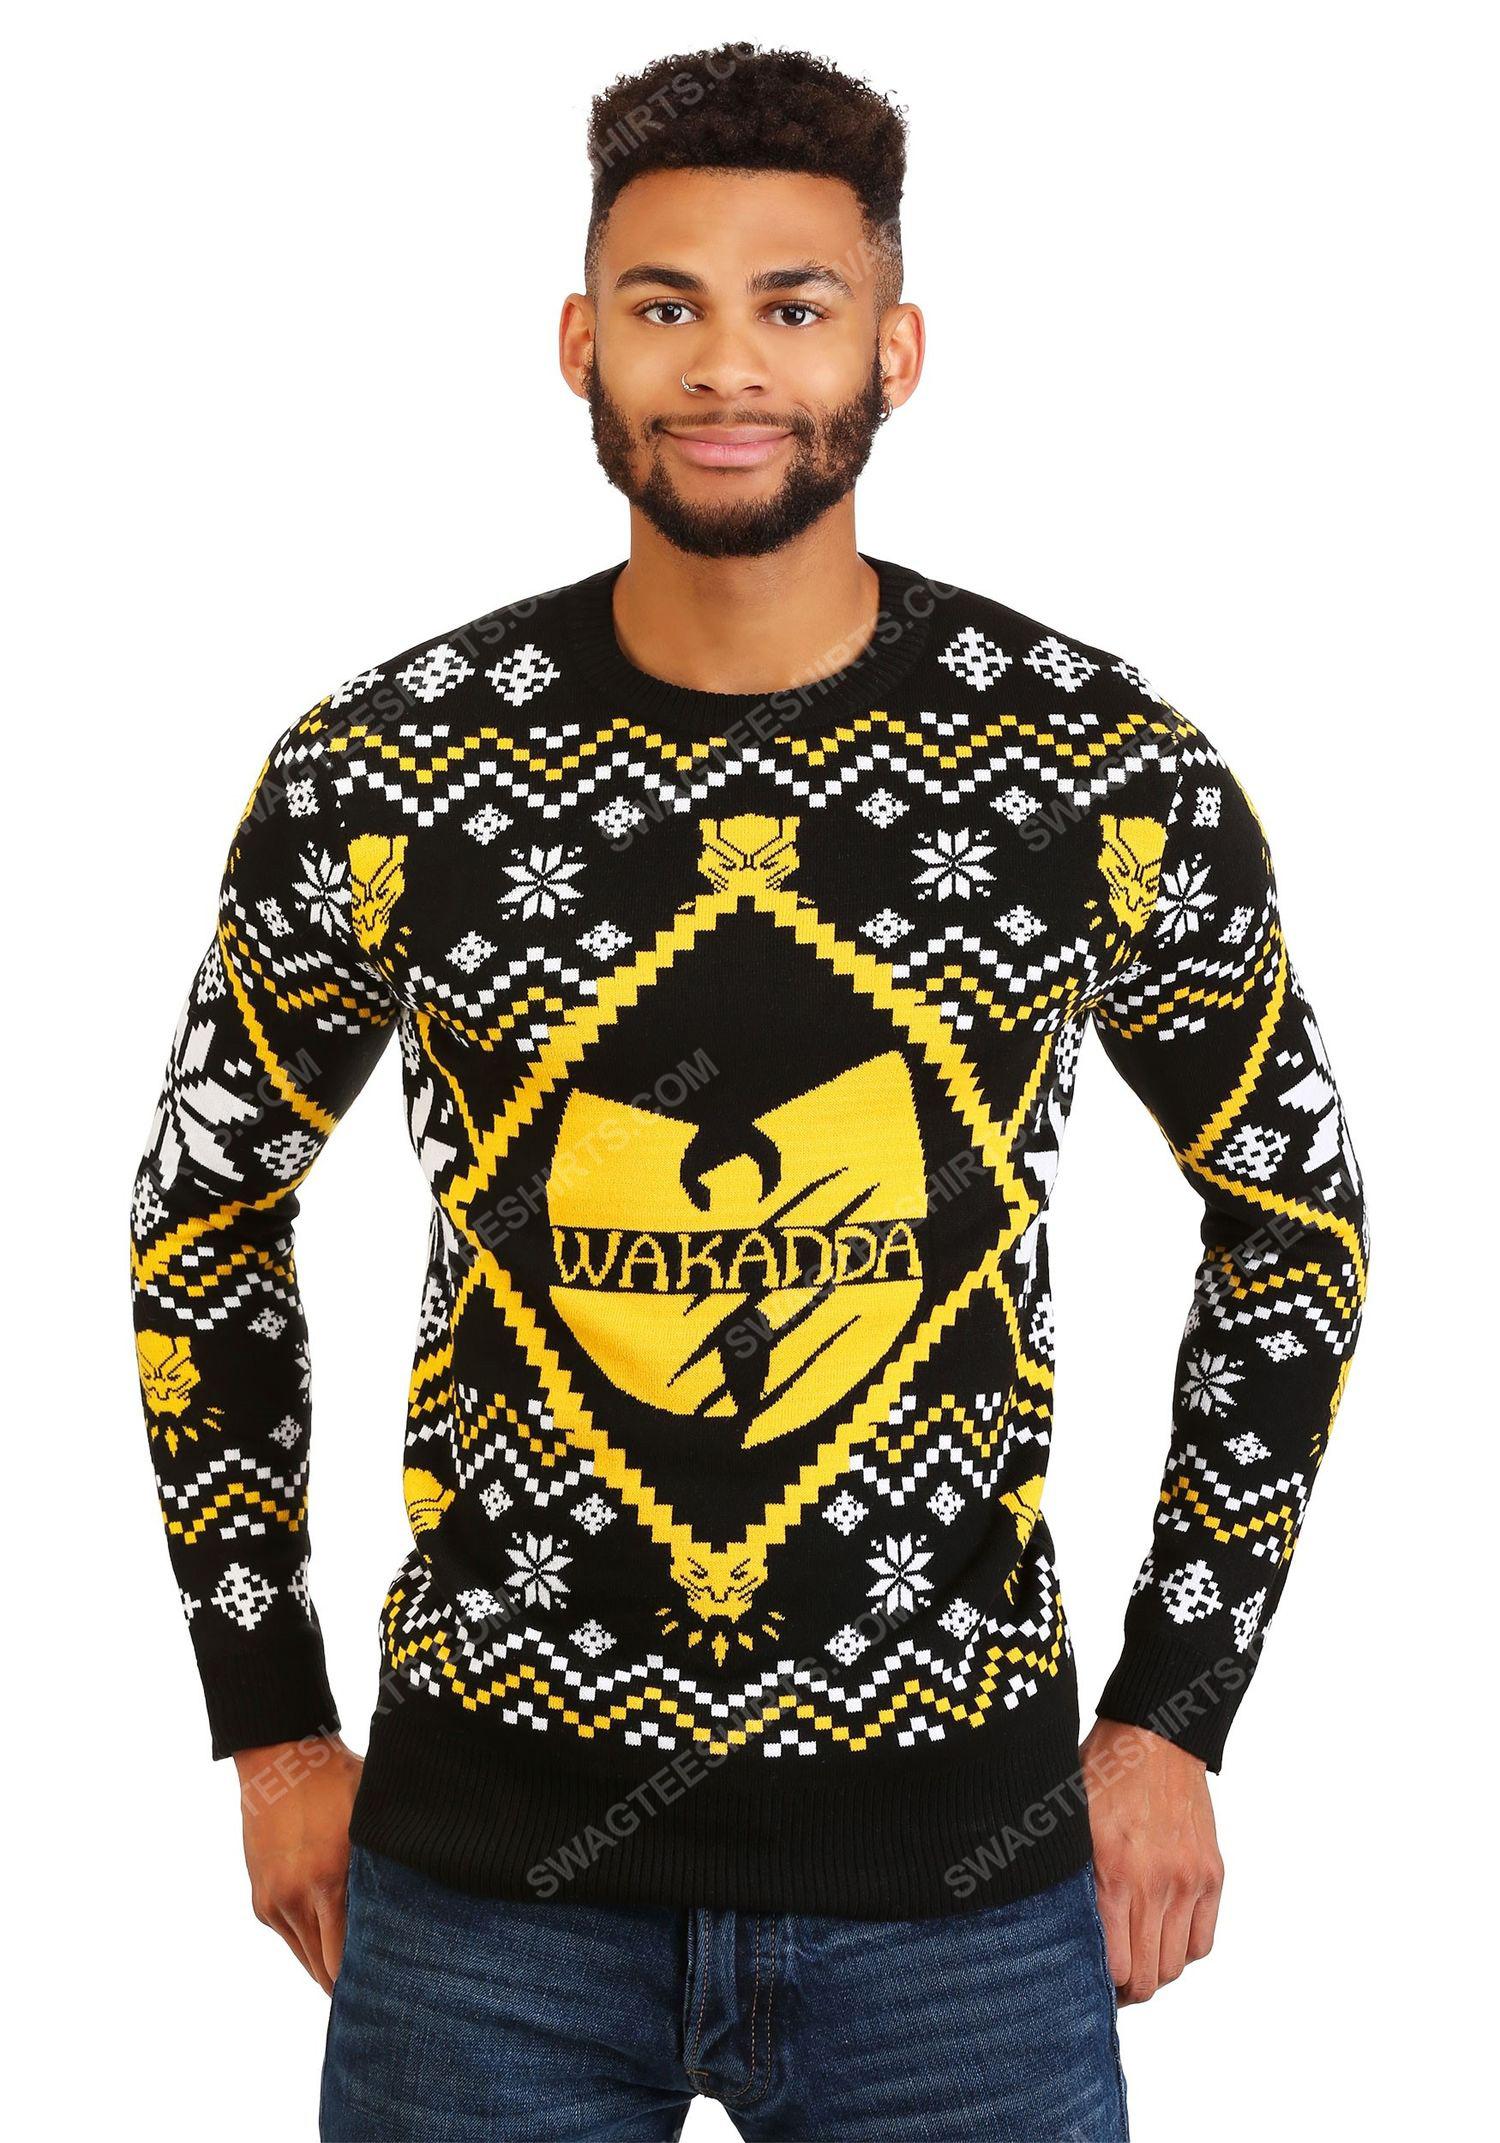 Wu tang clan black panther wakanda ugly christmas sweater 2 - Copy (2)